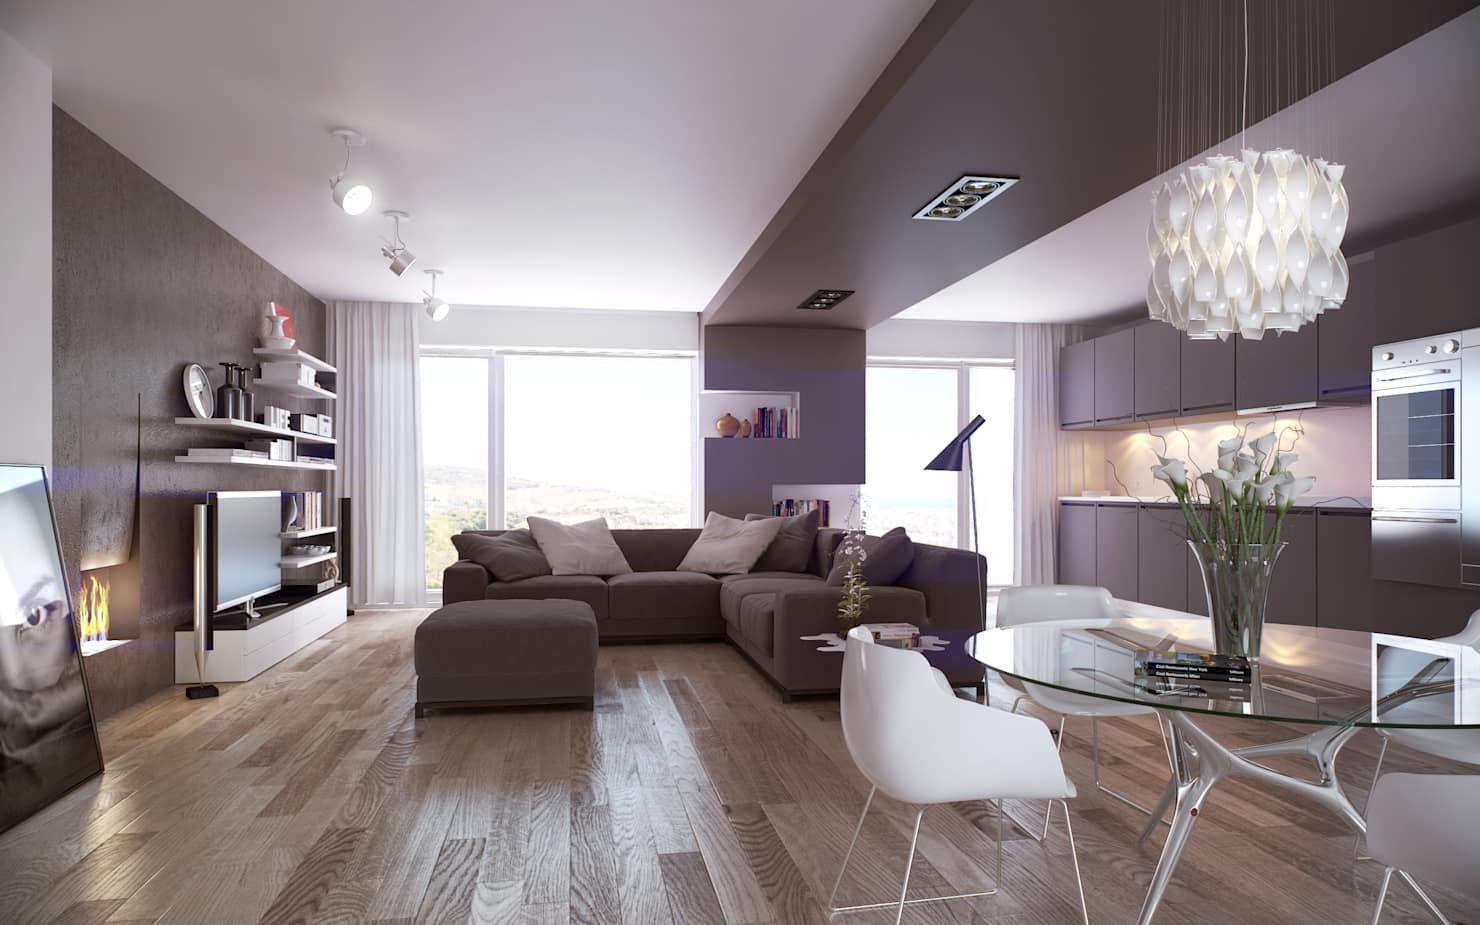 Living smag design soggiorno in stile scandinavo | homify ...